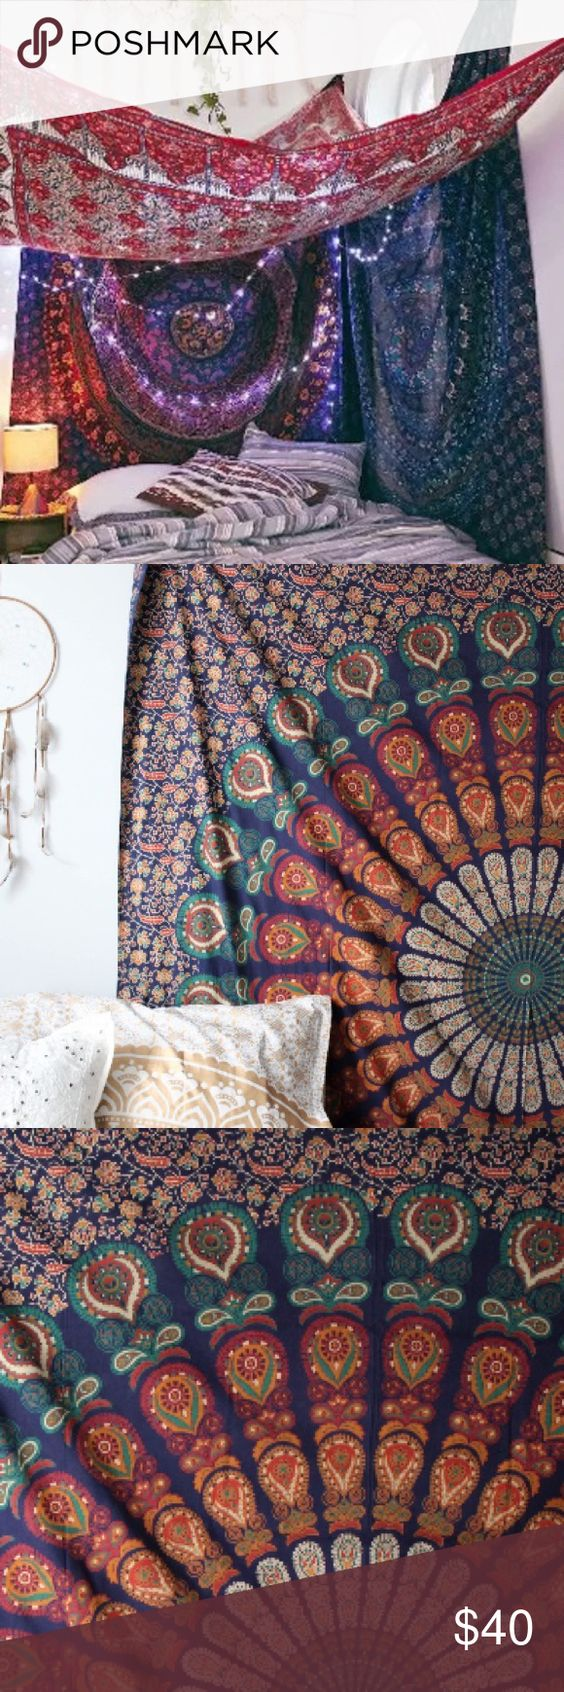 Mandala Tapestry Blue , red, orange, peacock design, dark blue floral background , beautiful Other